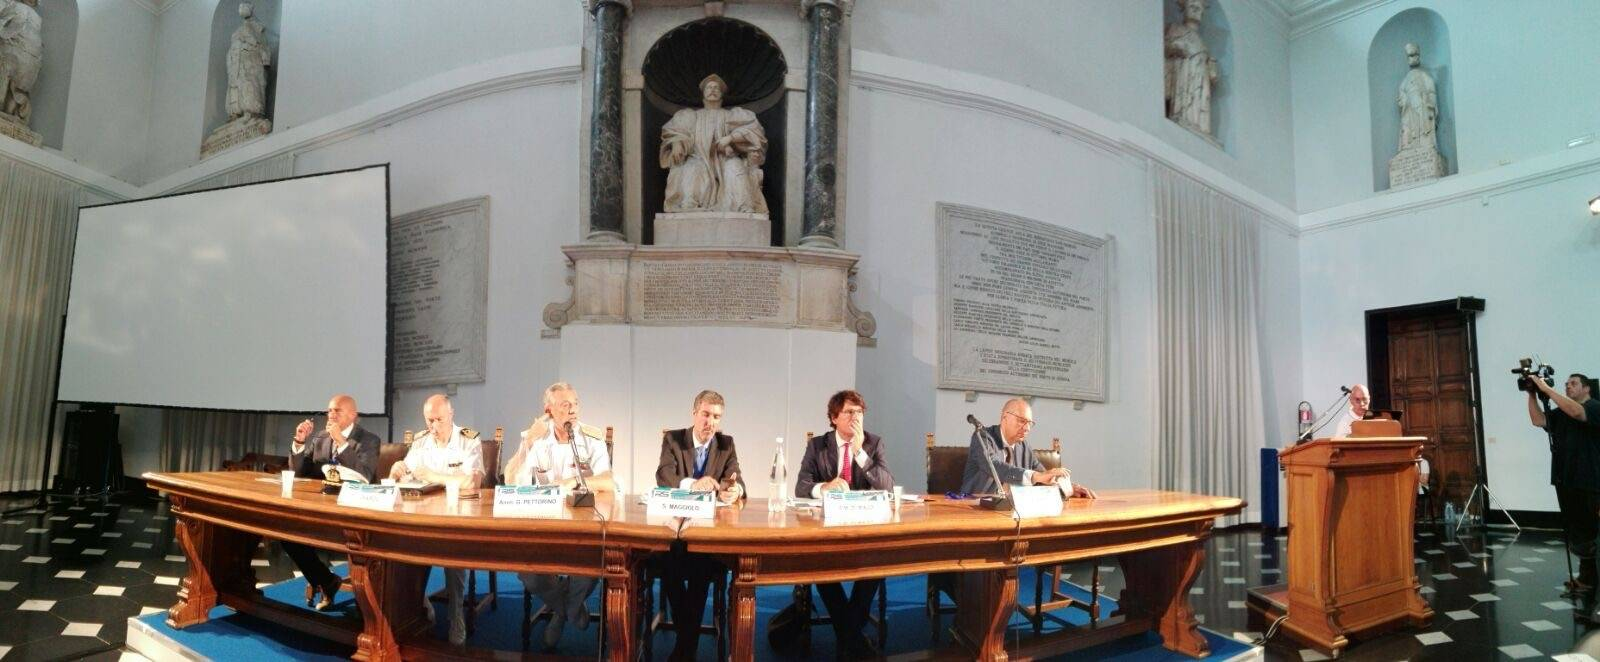 Forum Navi Genova